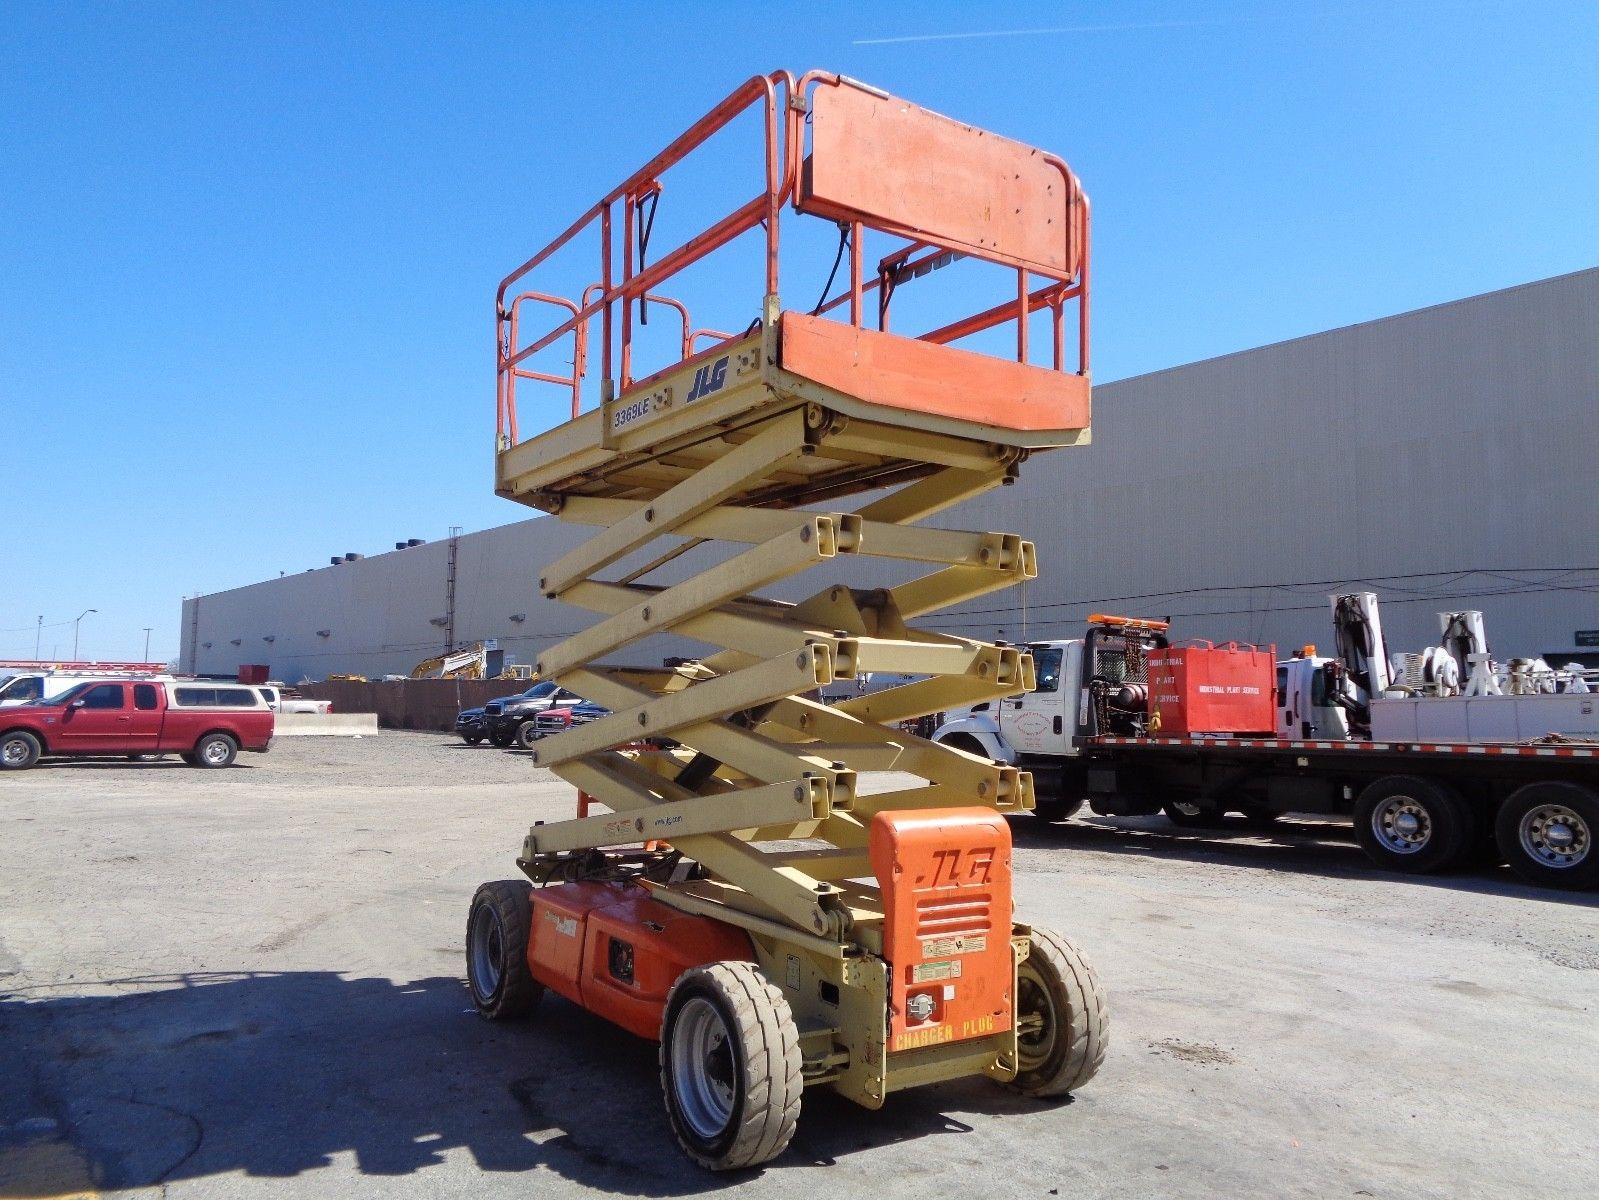 Lot 52 - JLG 3369LE Electric Aerial Man Boom Scissor Lift - 33ft Height